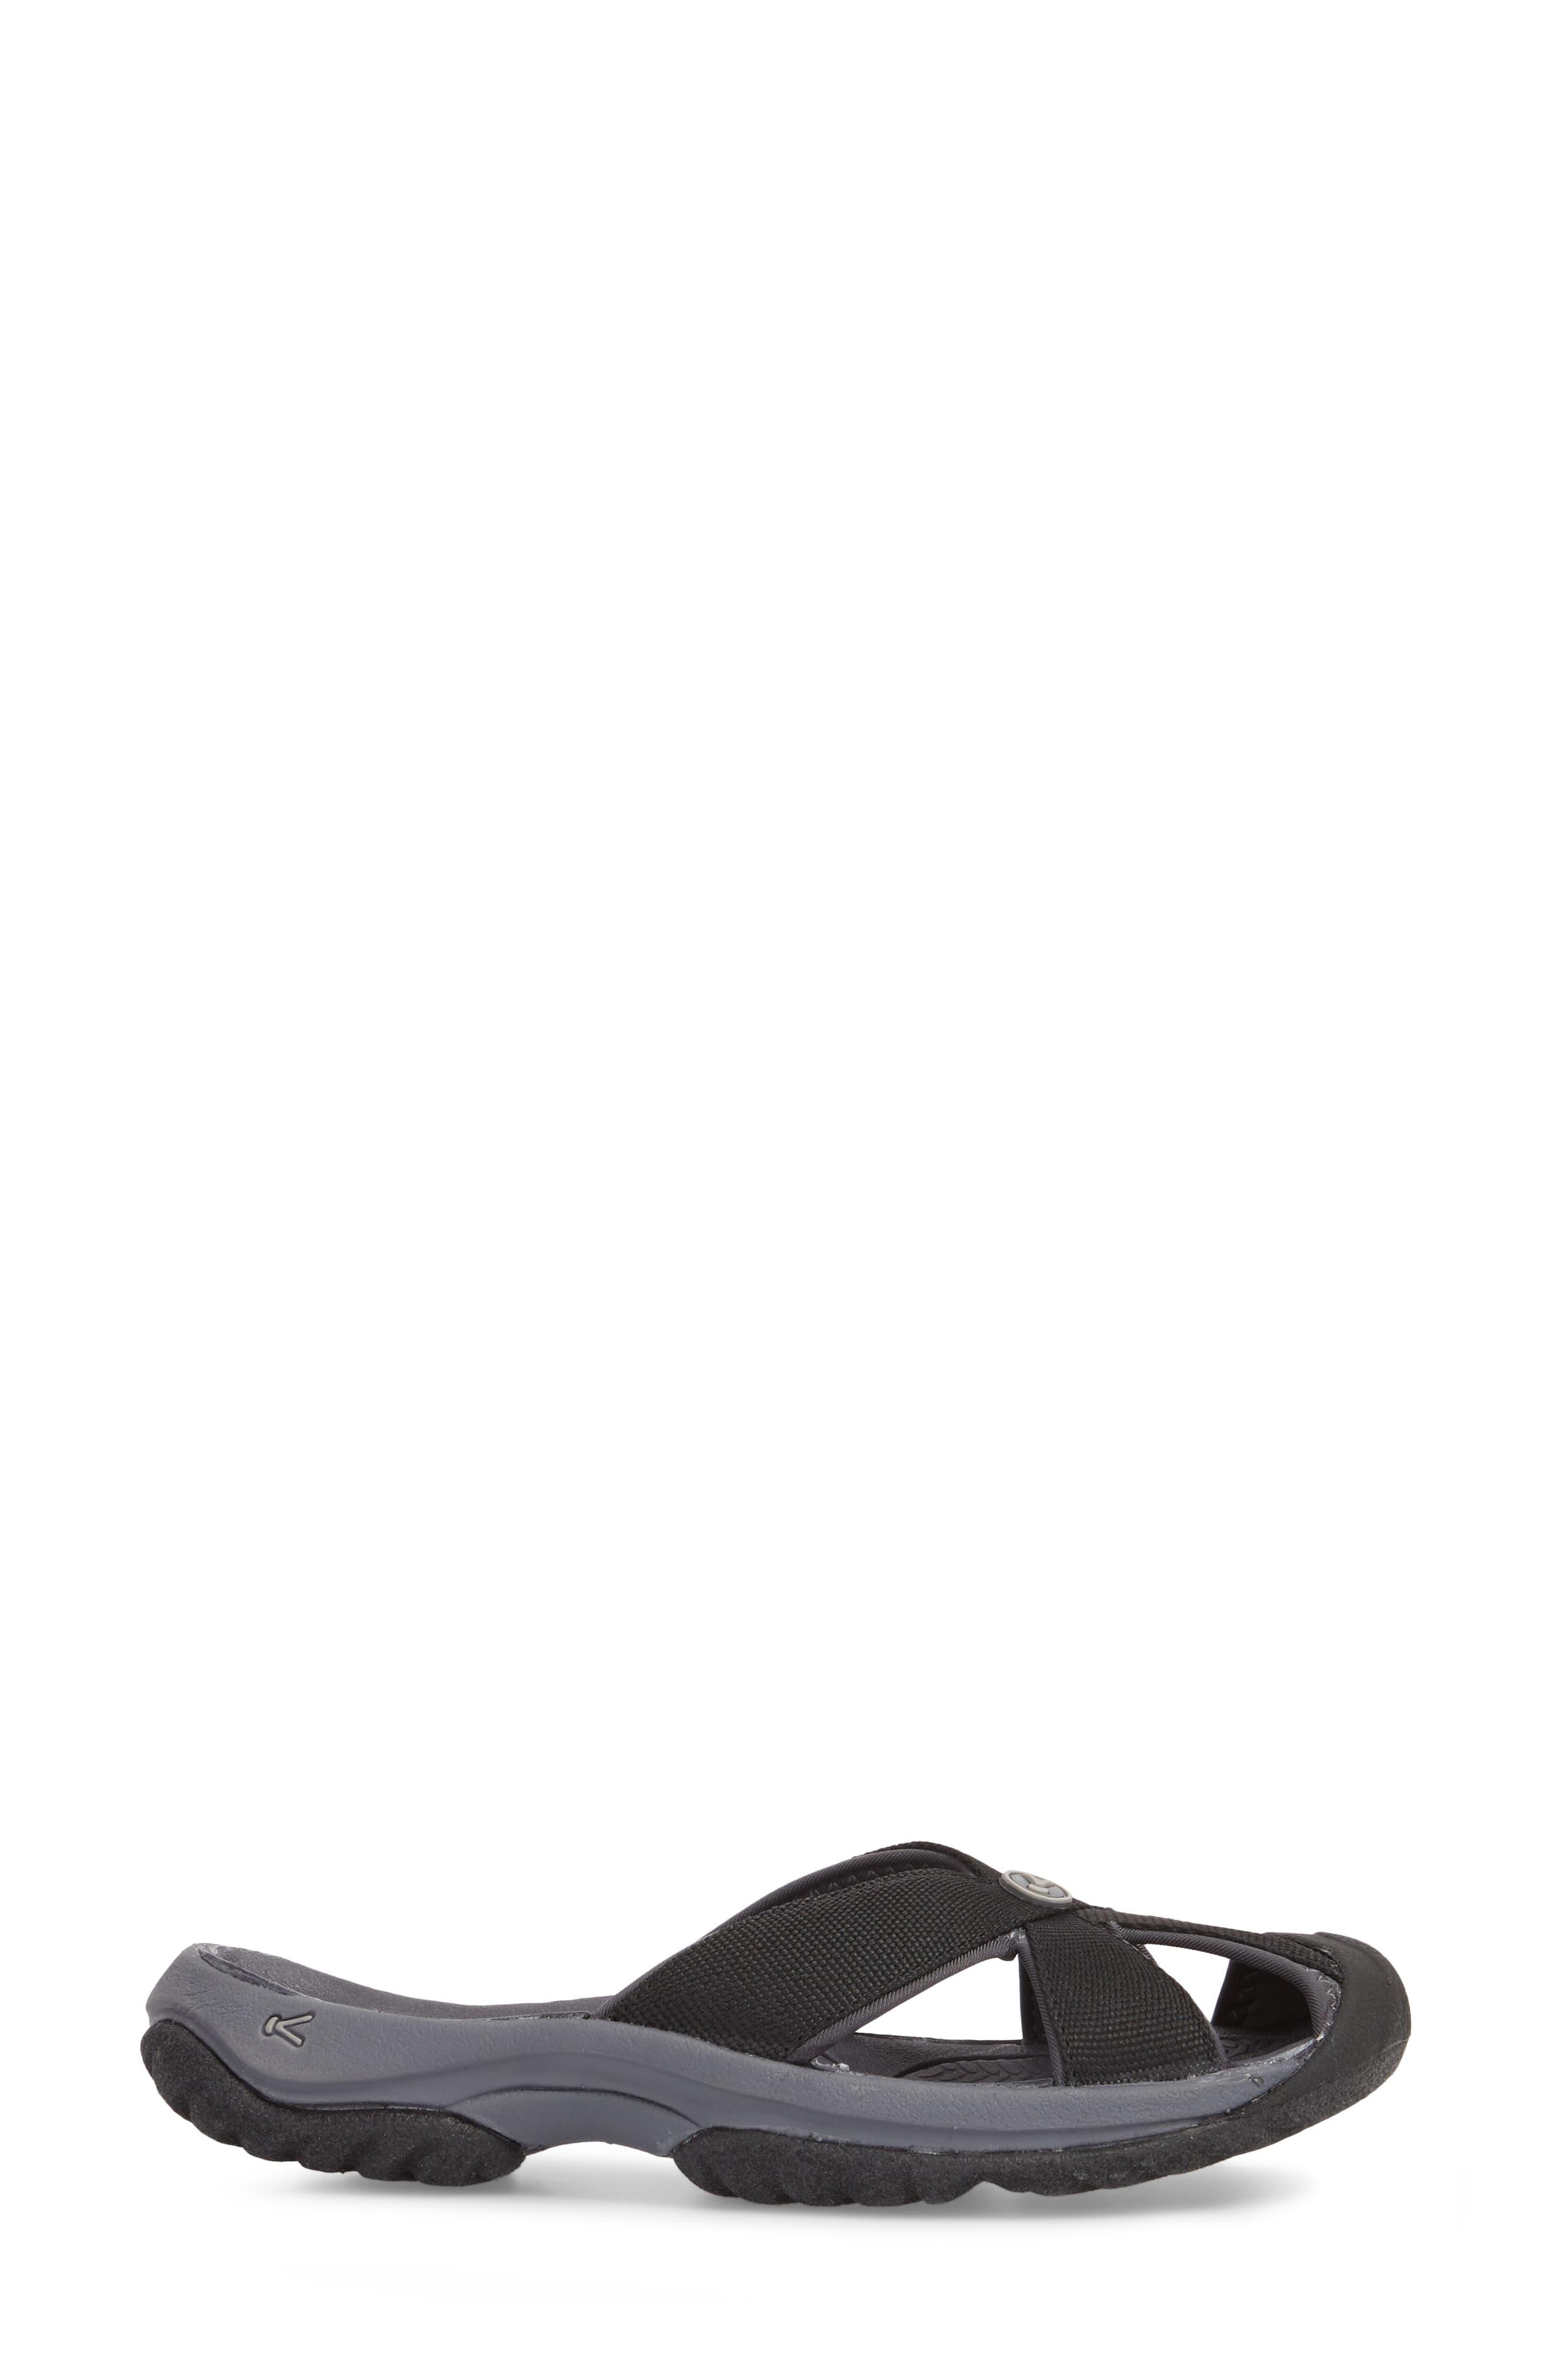 KEEN, 'Bali' Sandal, Alternate thumbnail 3, color, BLACK/ MAGNET